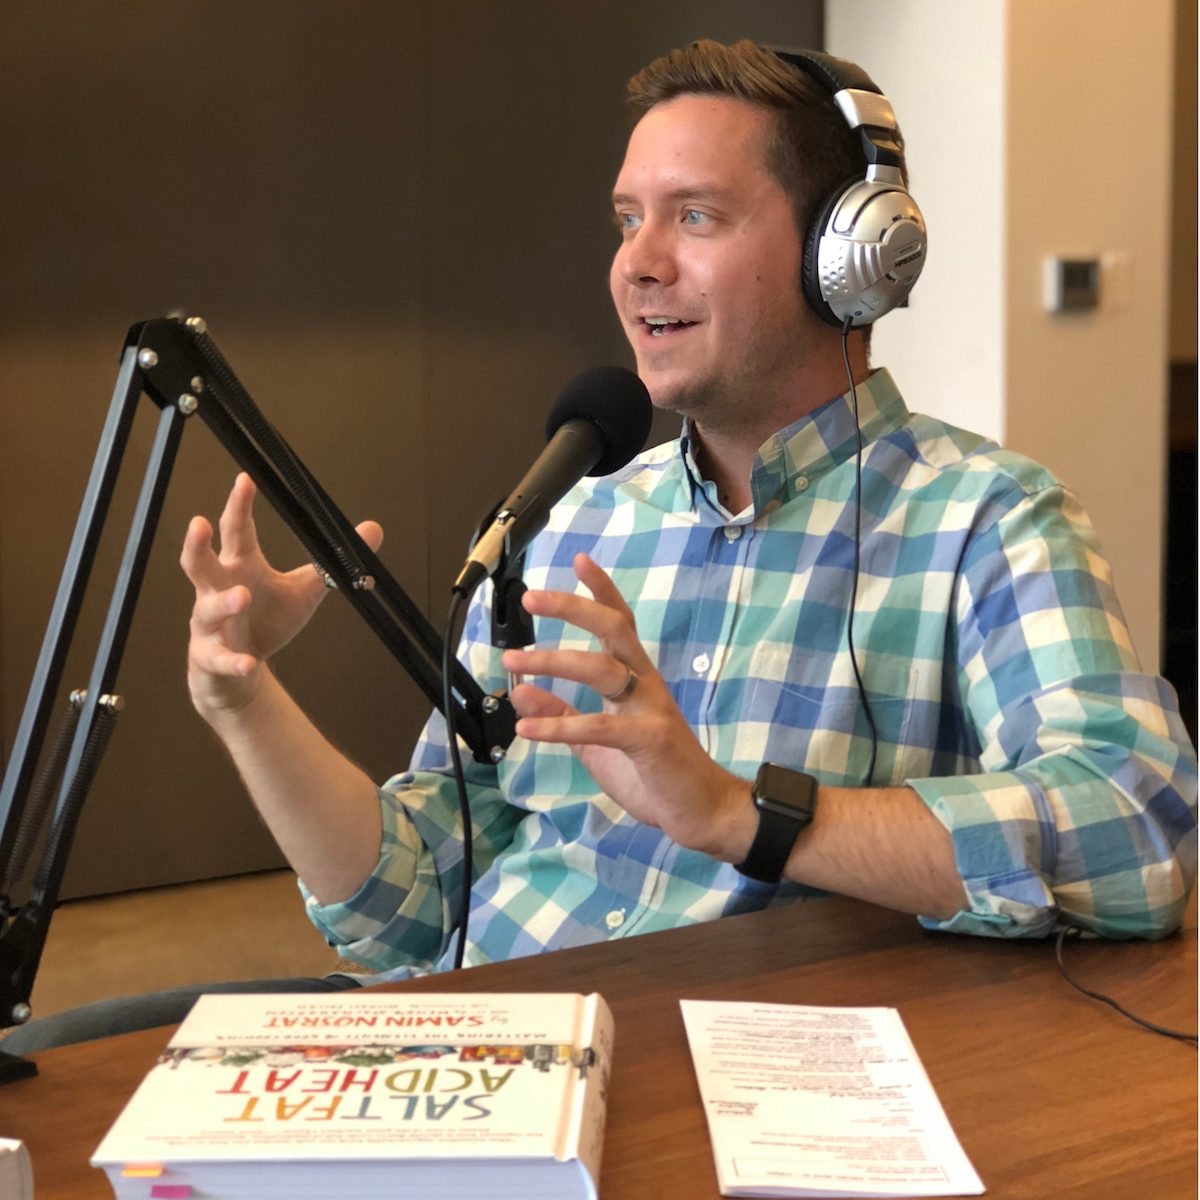 Brian Stewart, host of the Salt + Spine podcast.